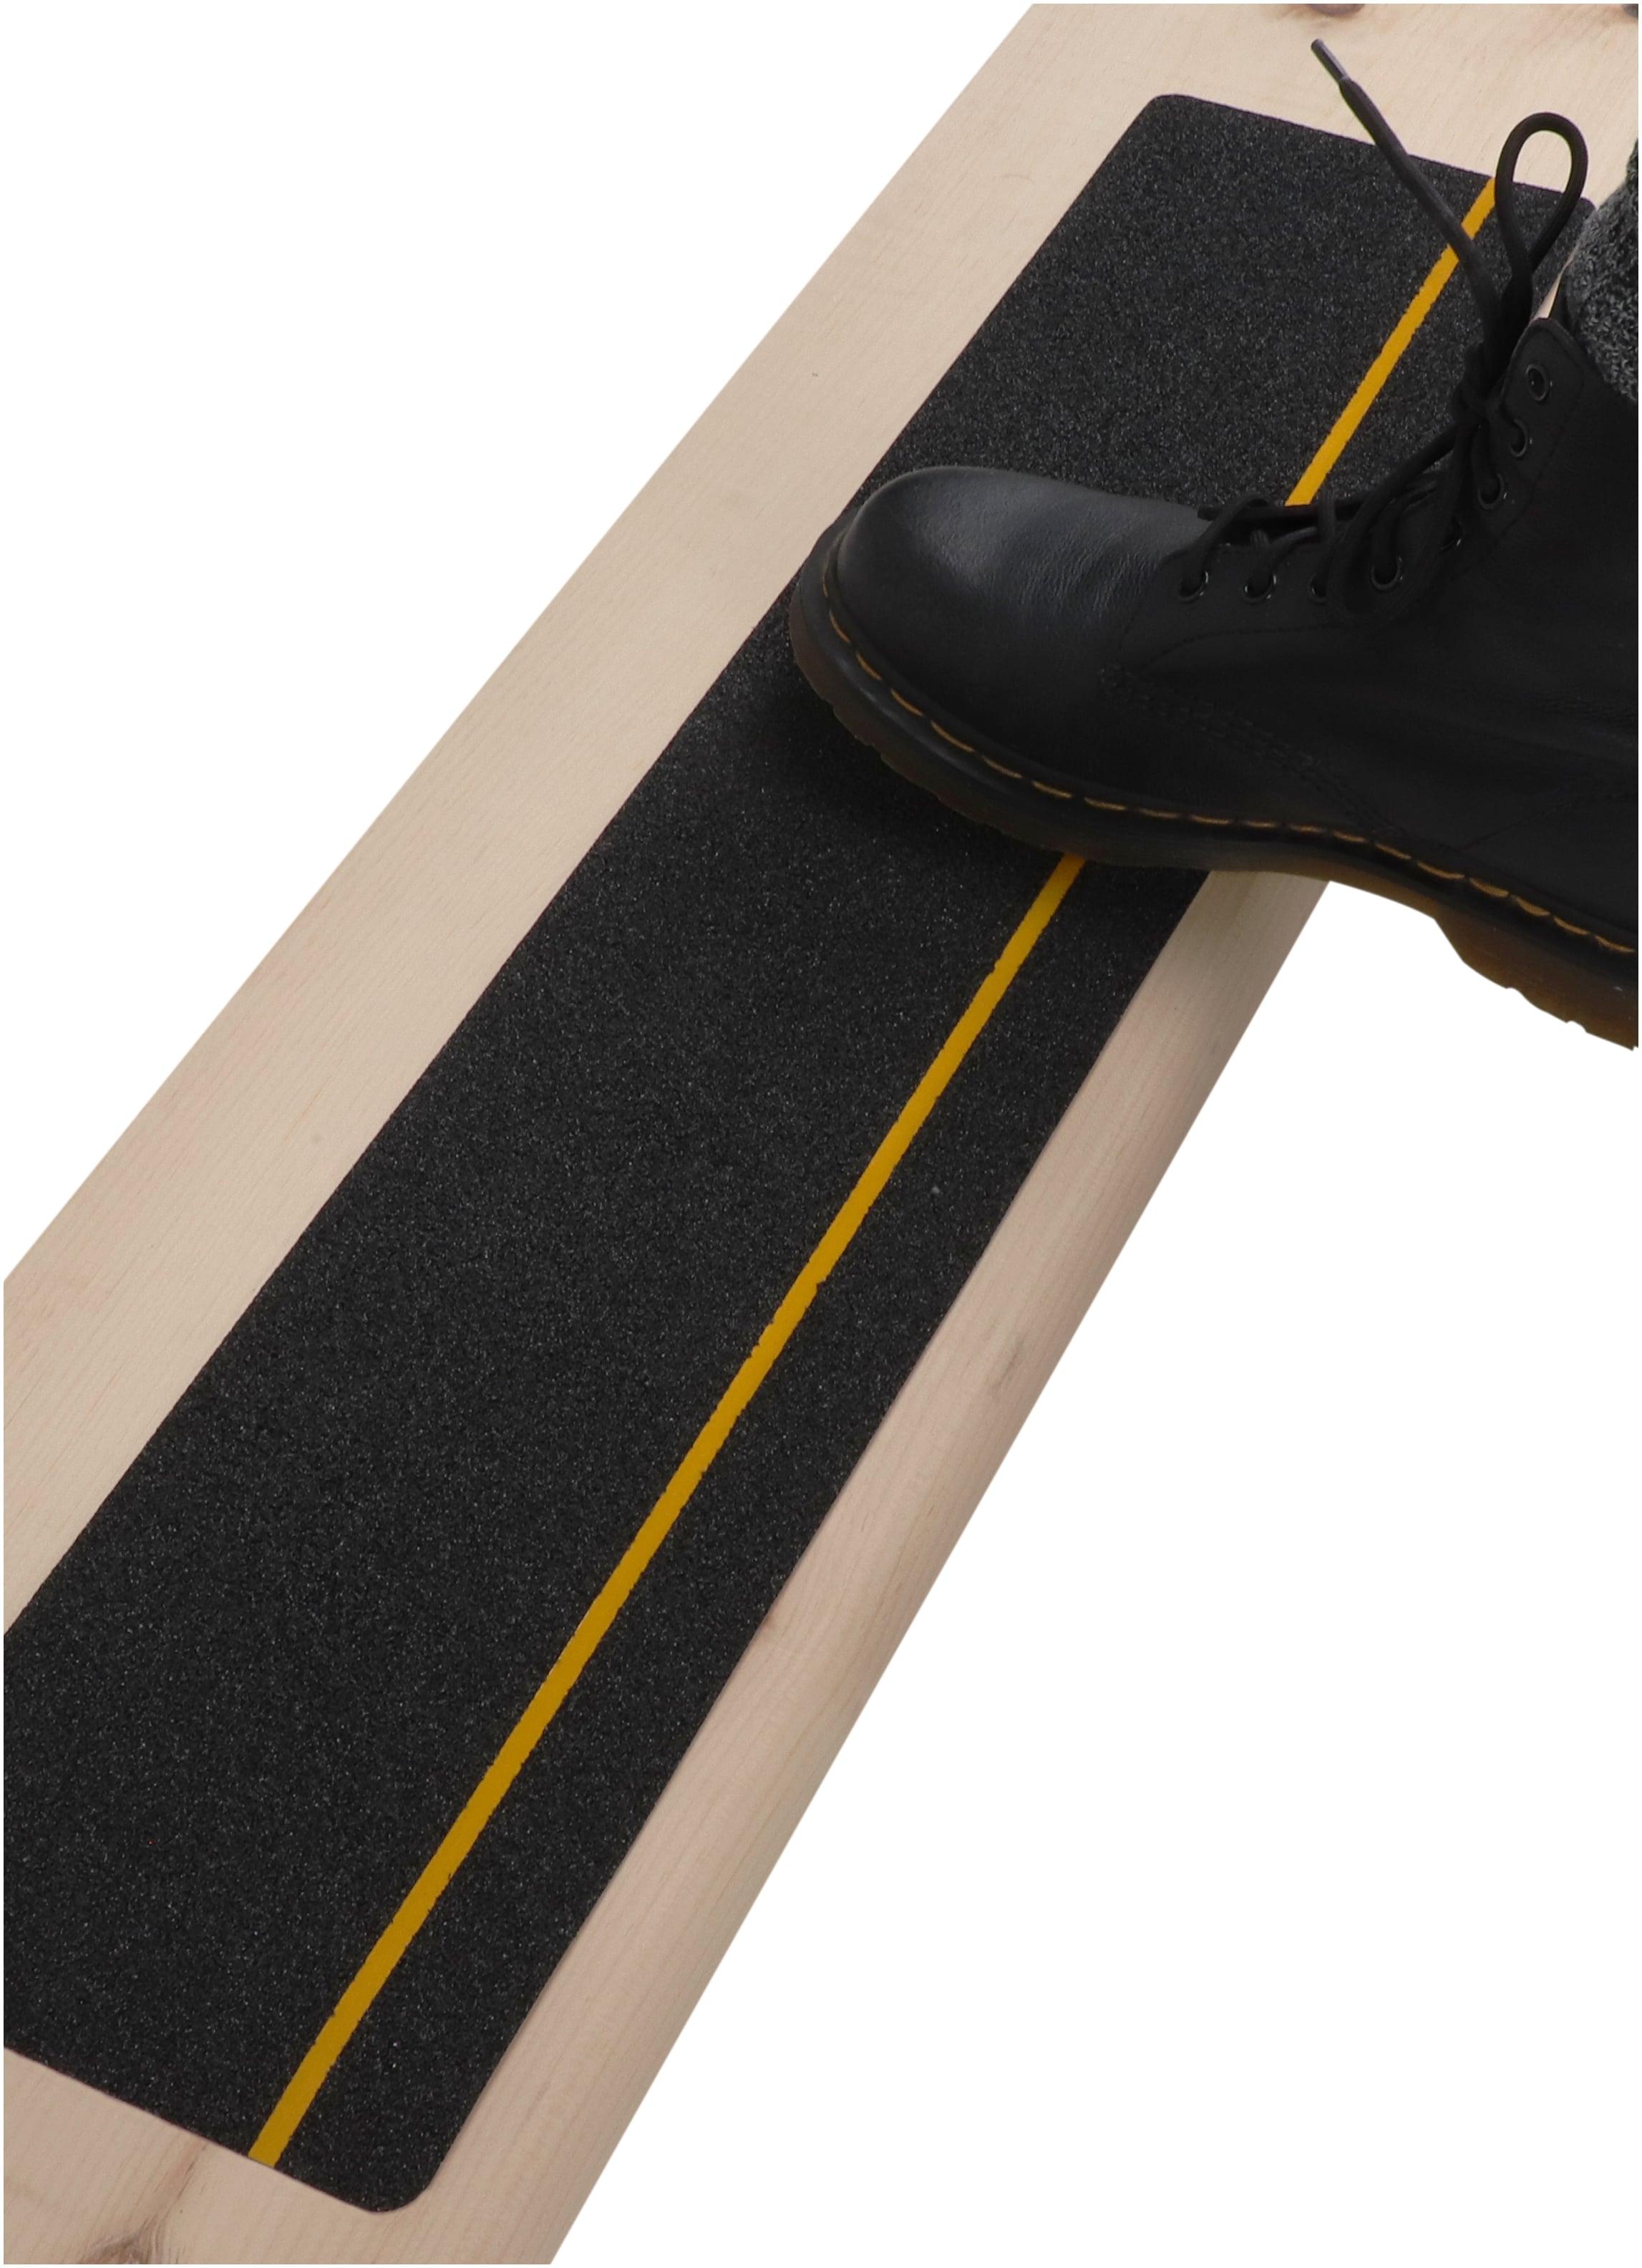 6 X30 Non Slip Stair Treads Outdoor 10 Pack Reflective Anti Slip Tape Finehous